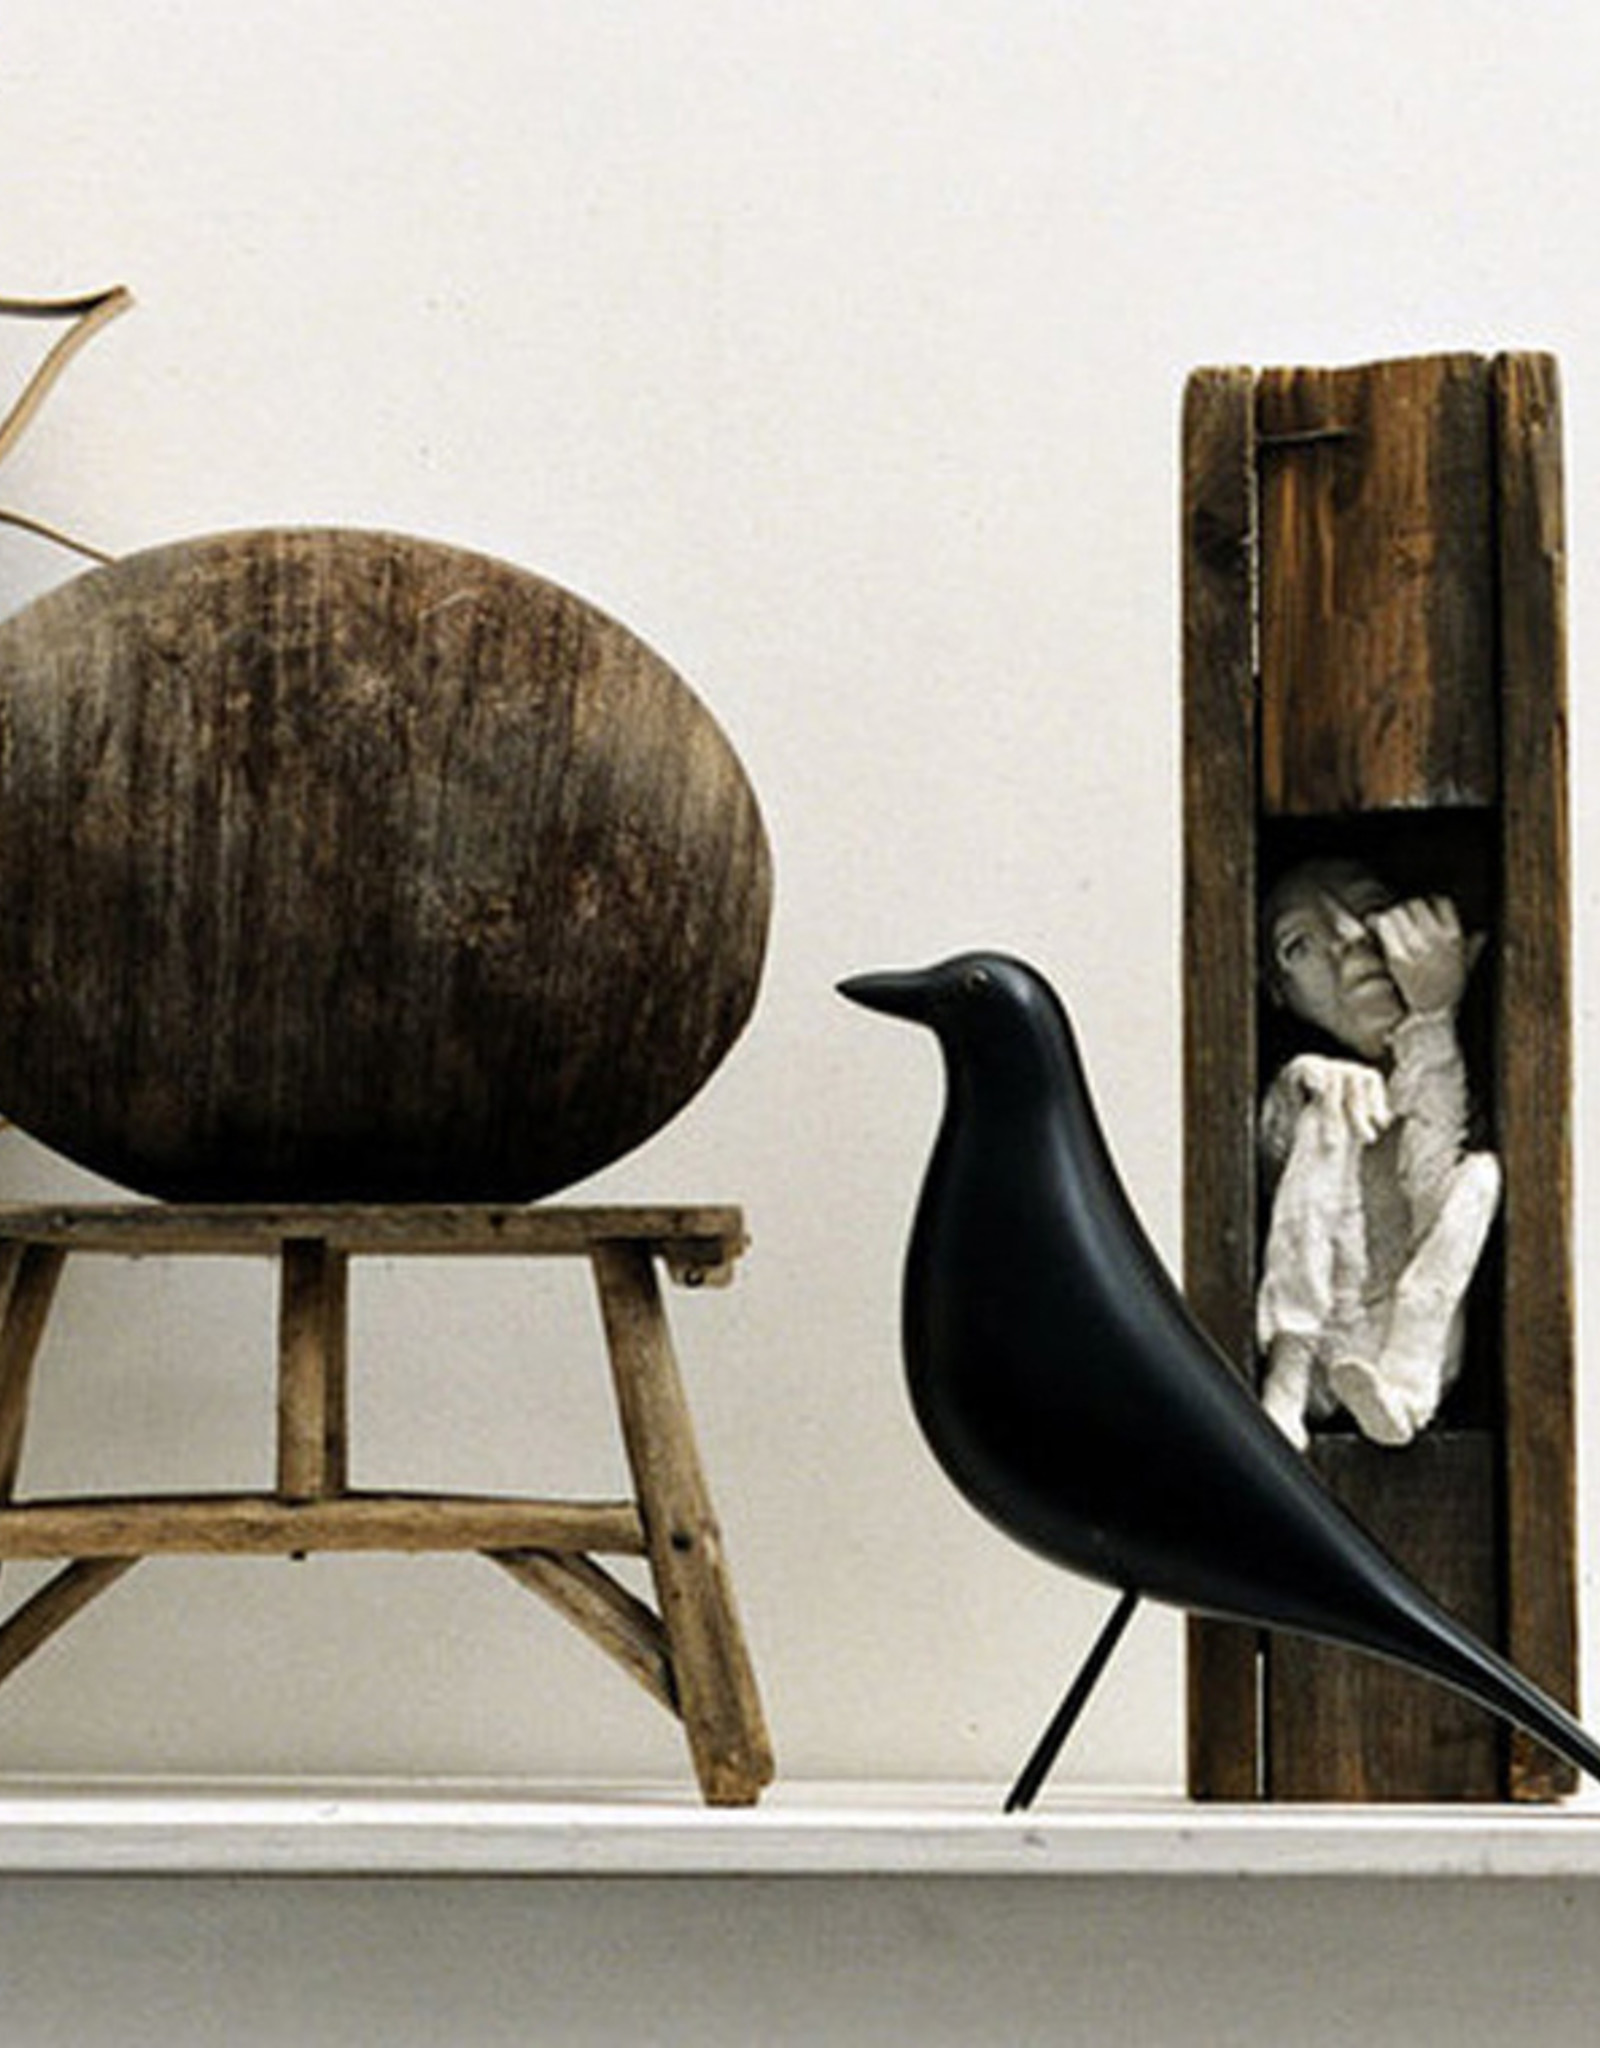 VITRA  EAMES HOUSE BIRD - ELZENHOUT